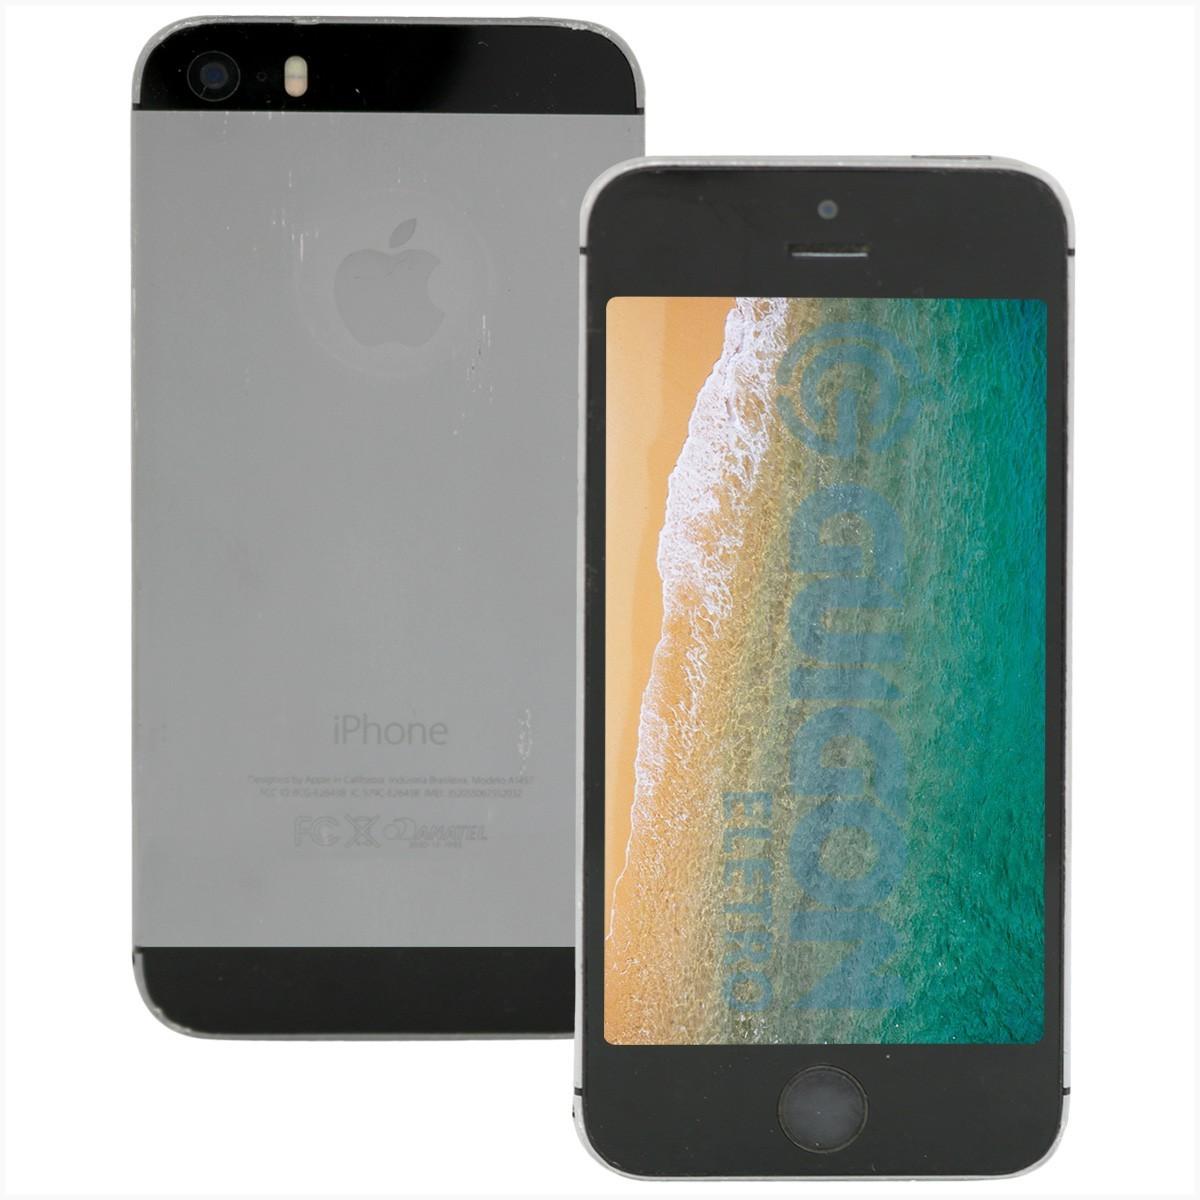 Iphone 5s a1457 16gb - usado